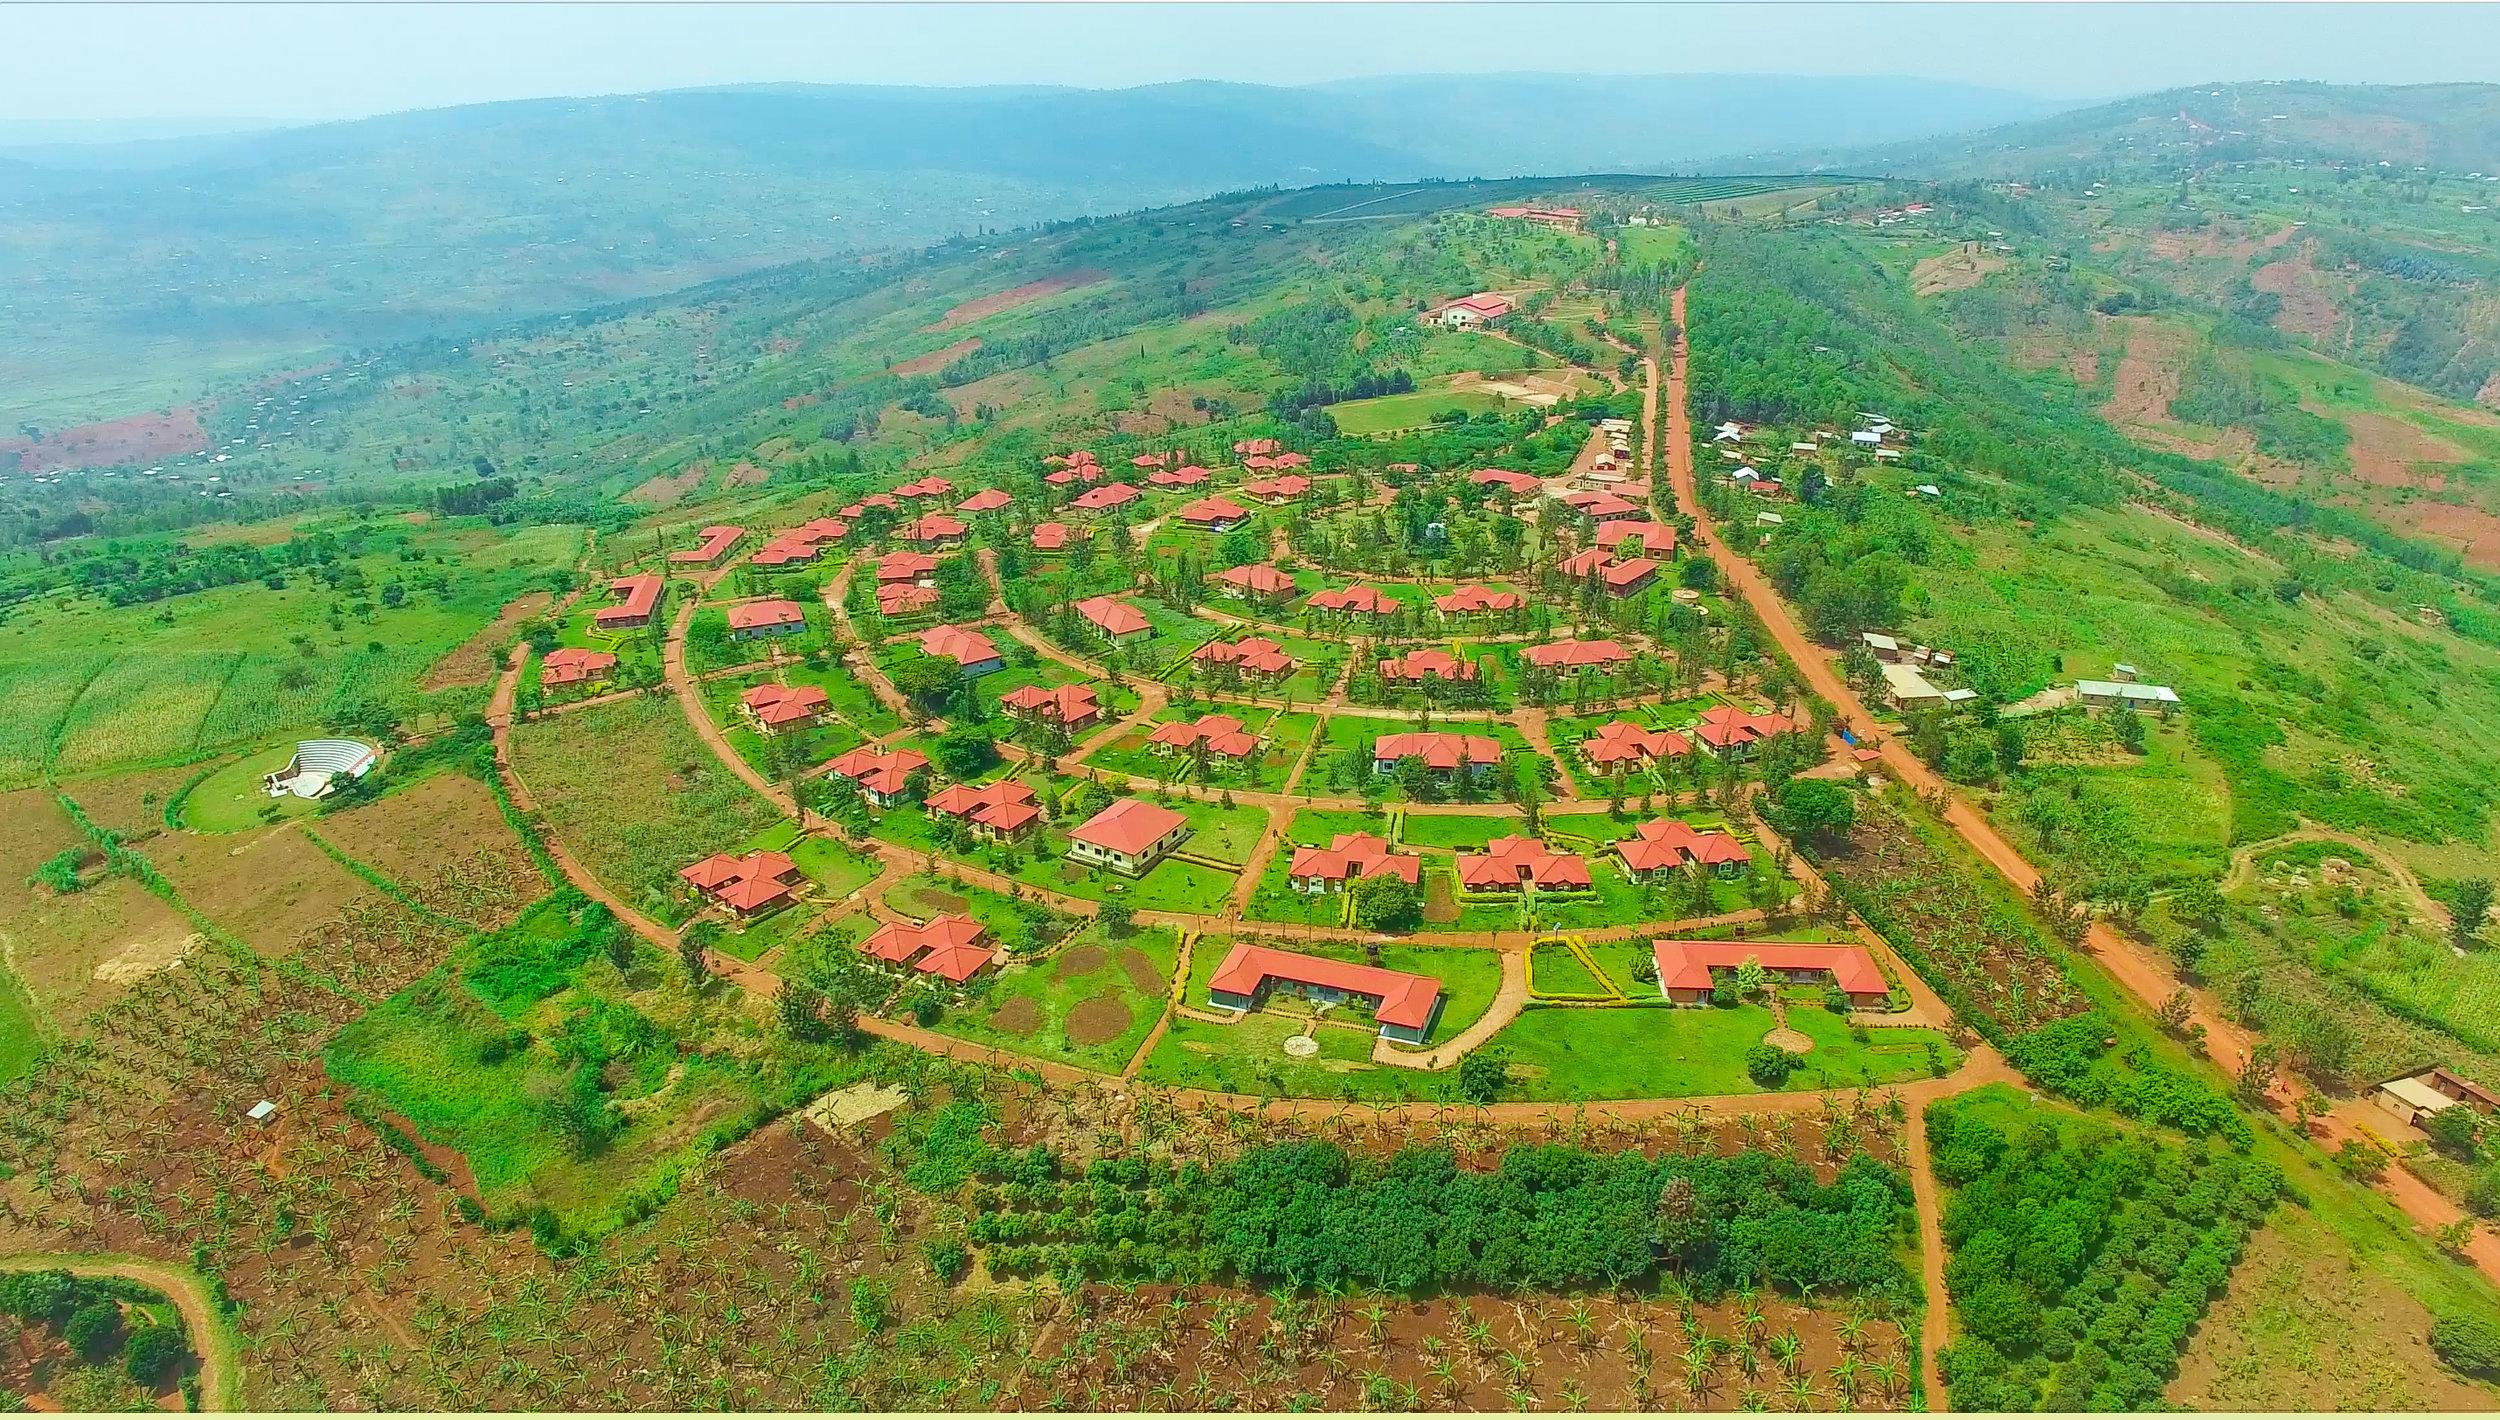 The Agahozo-Shalom Youth Village -  Rwamagana, Rwanda